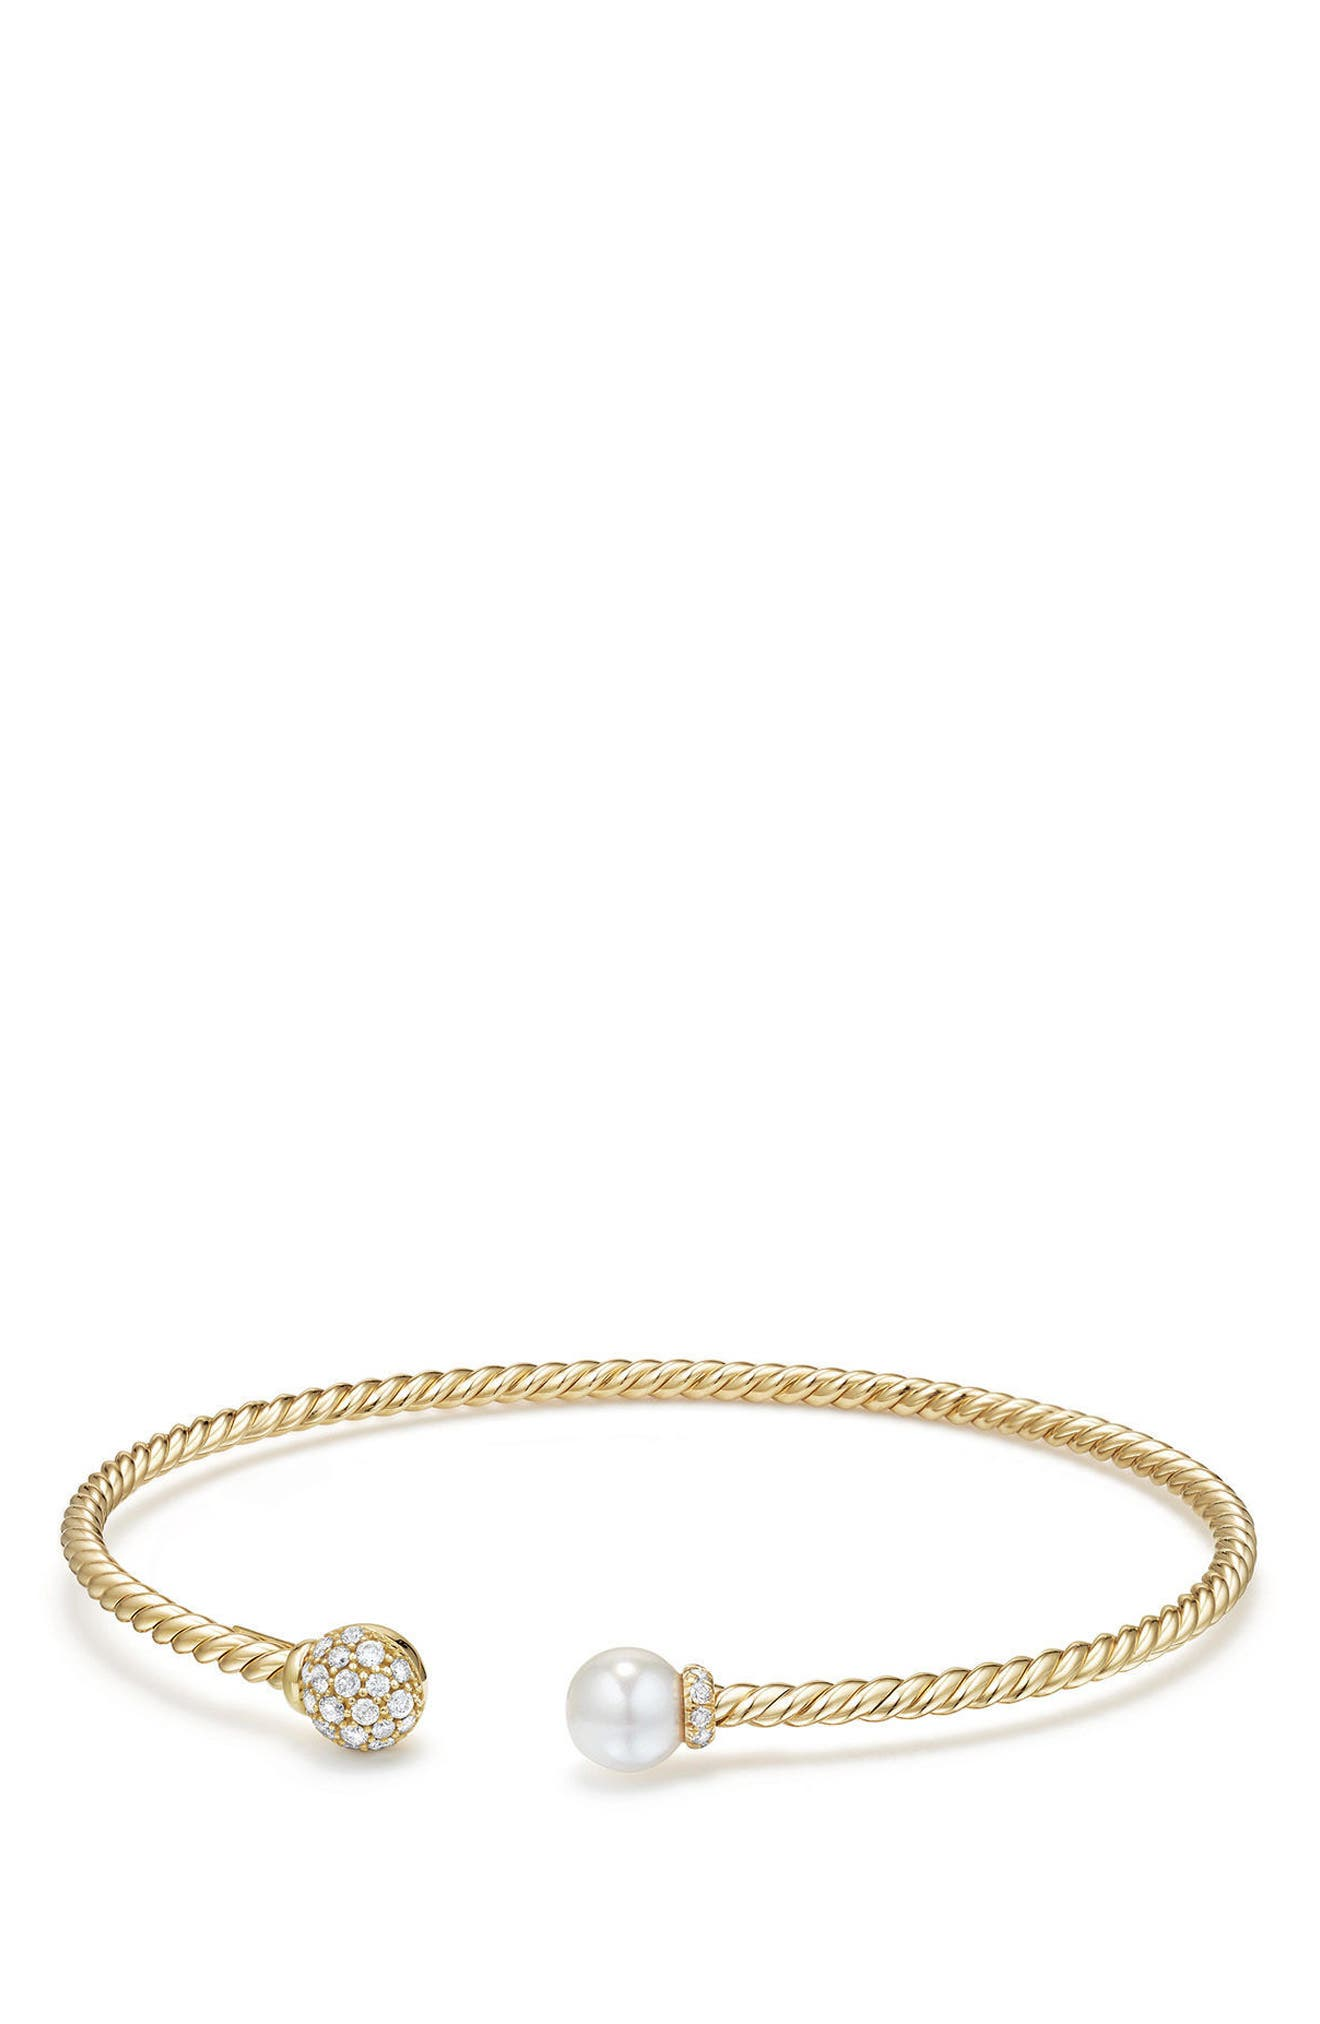 David Yurman Solari Bead & Pearl Bracelet with Diamonds in 18K Gold